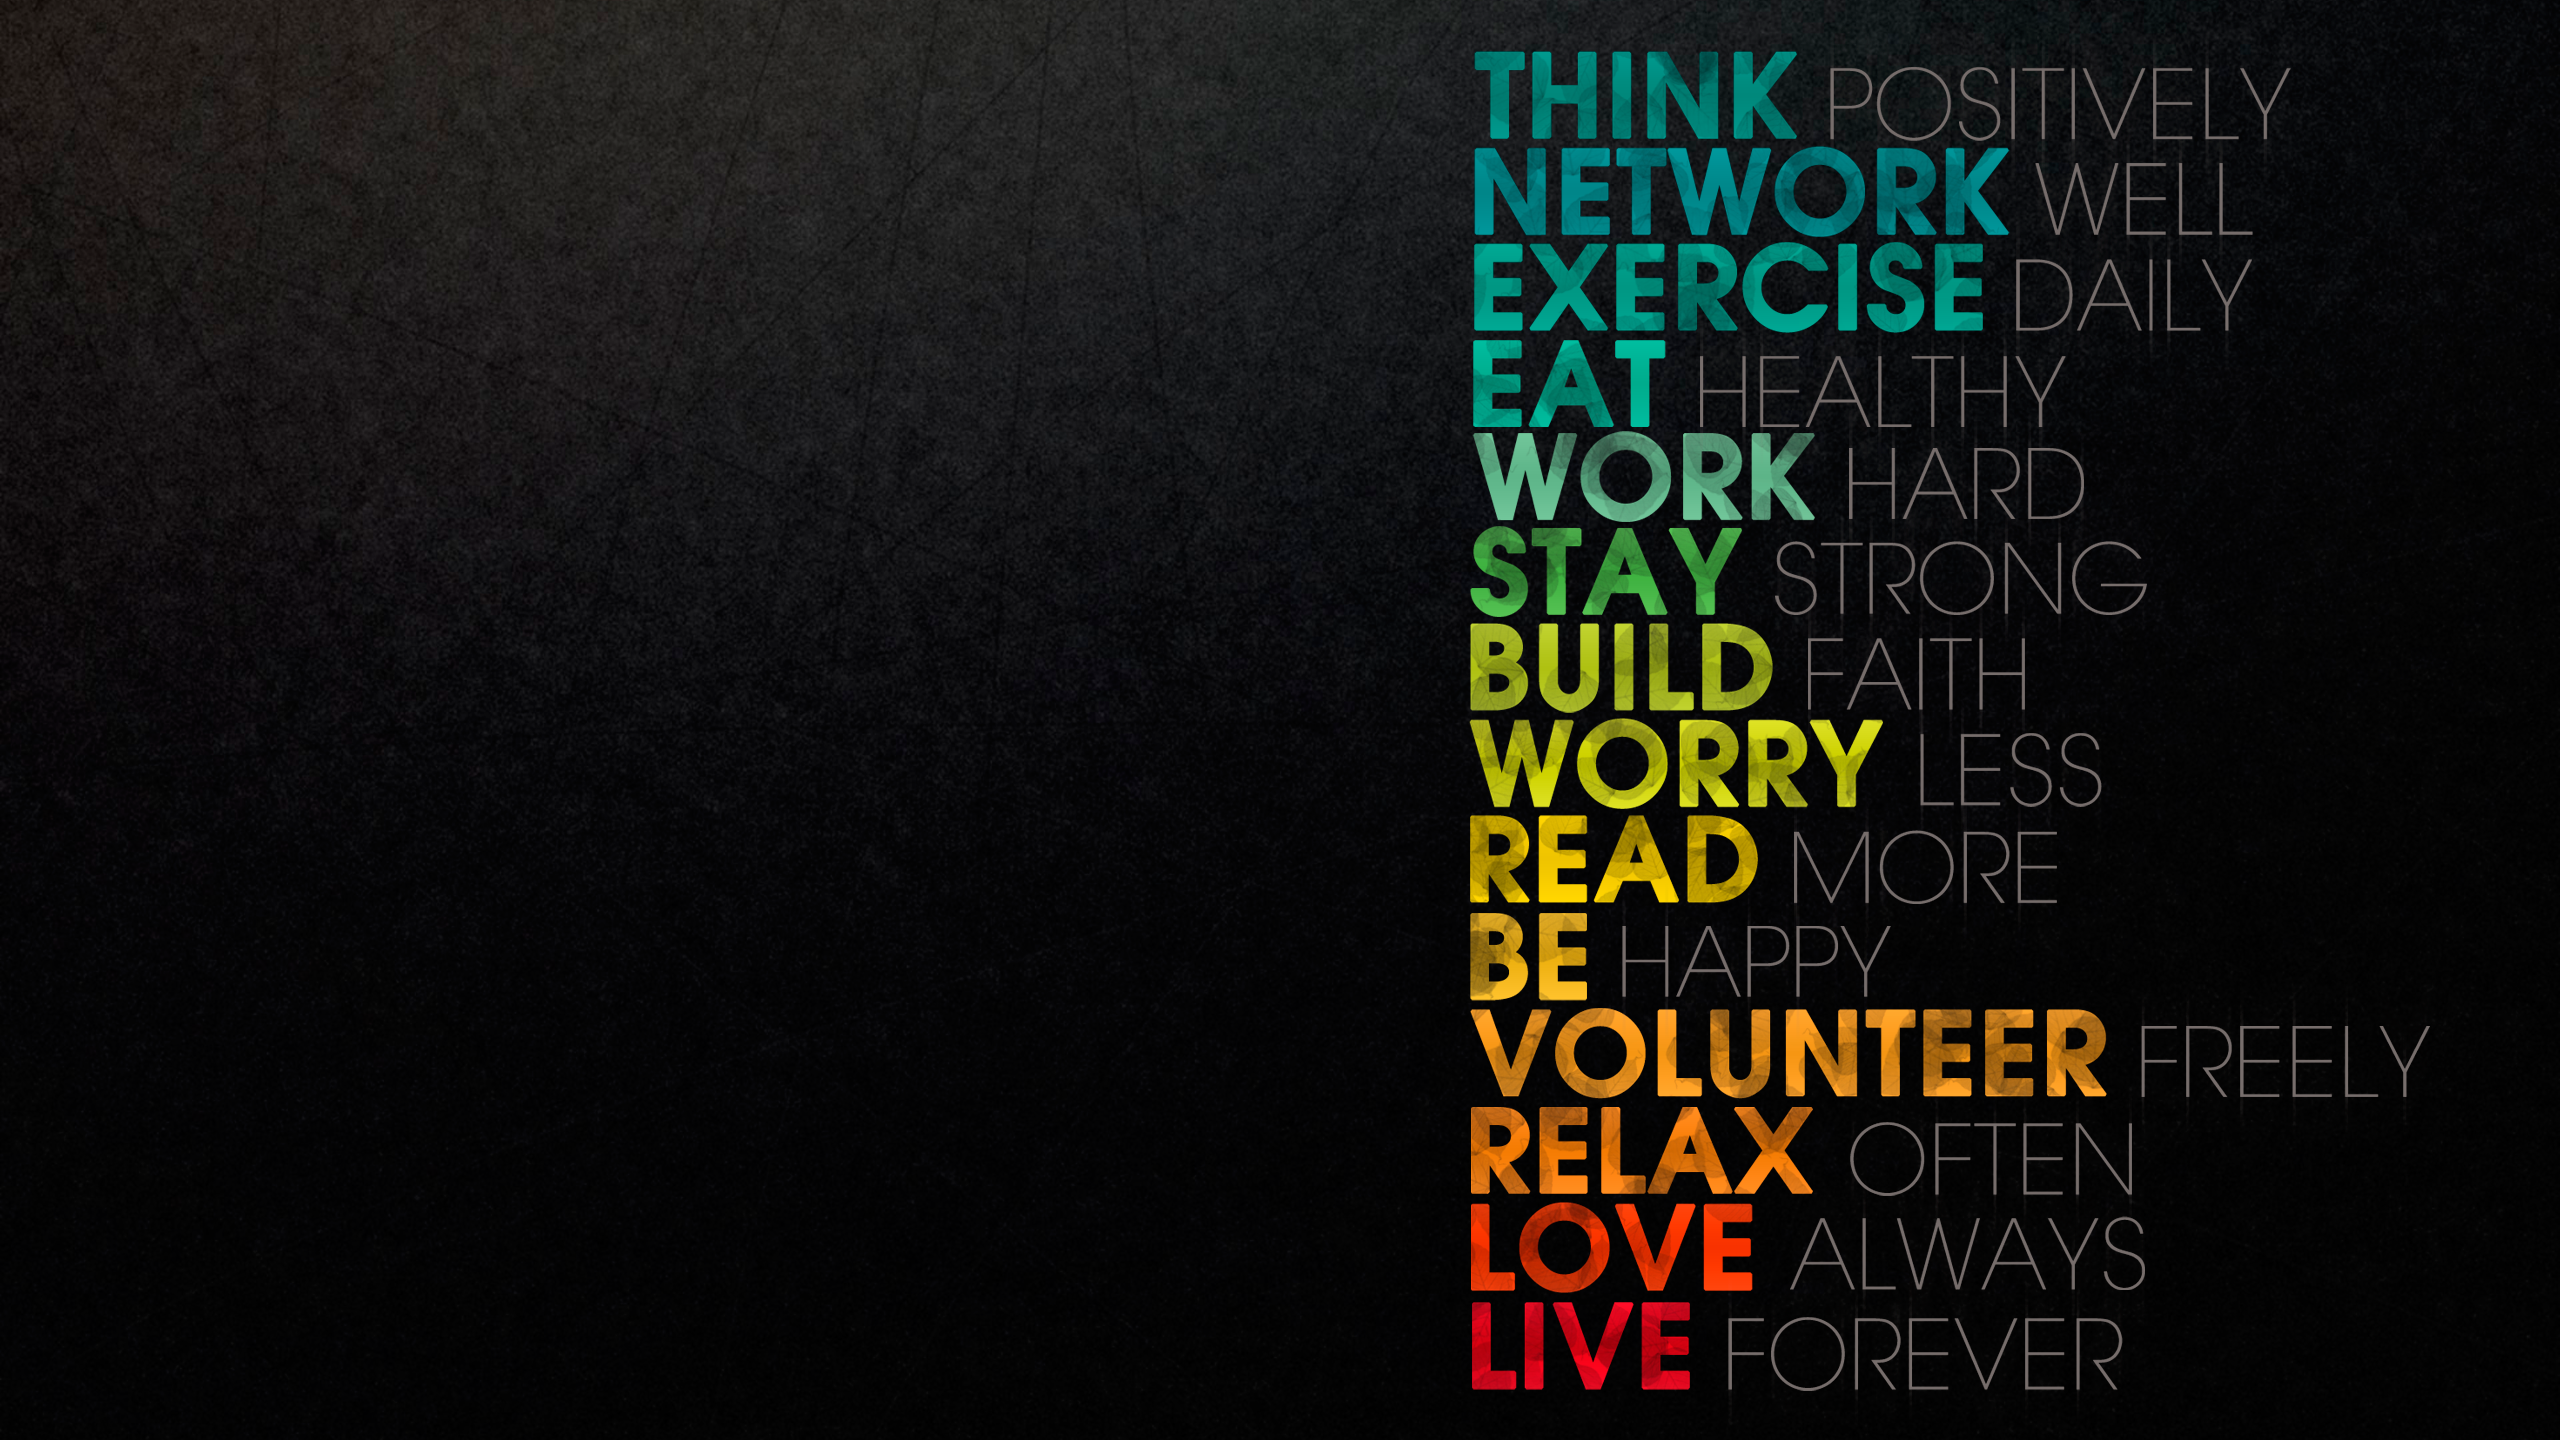 Mobile And Desktop Wallpaper Hd Motivational Quotes Wallpaper Inspirational Quotes Wallpapers Motivational Wallpaper